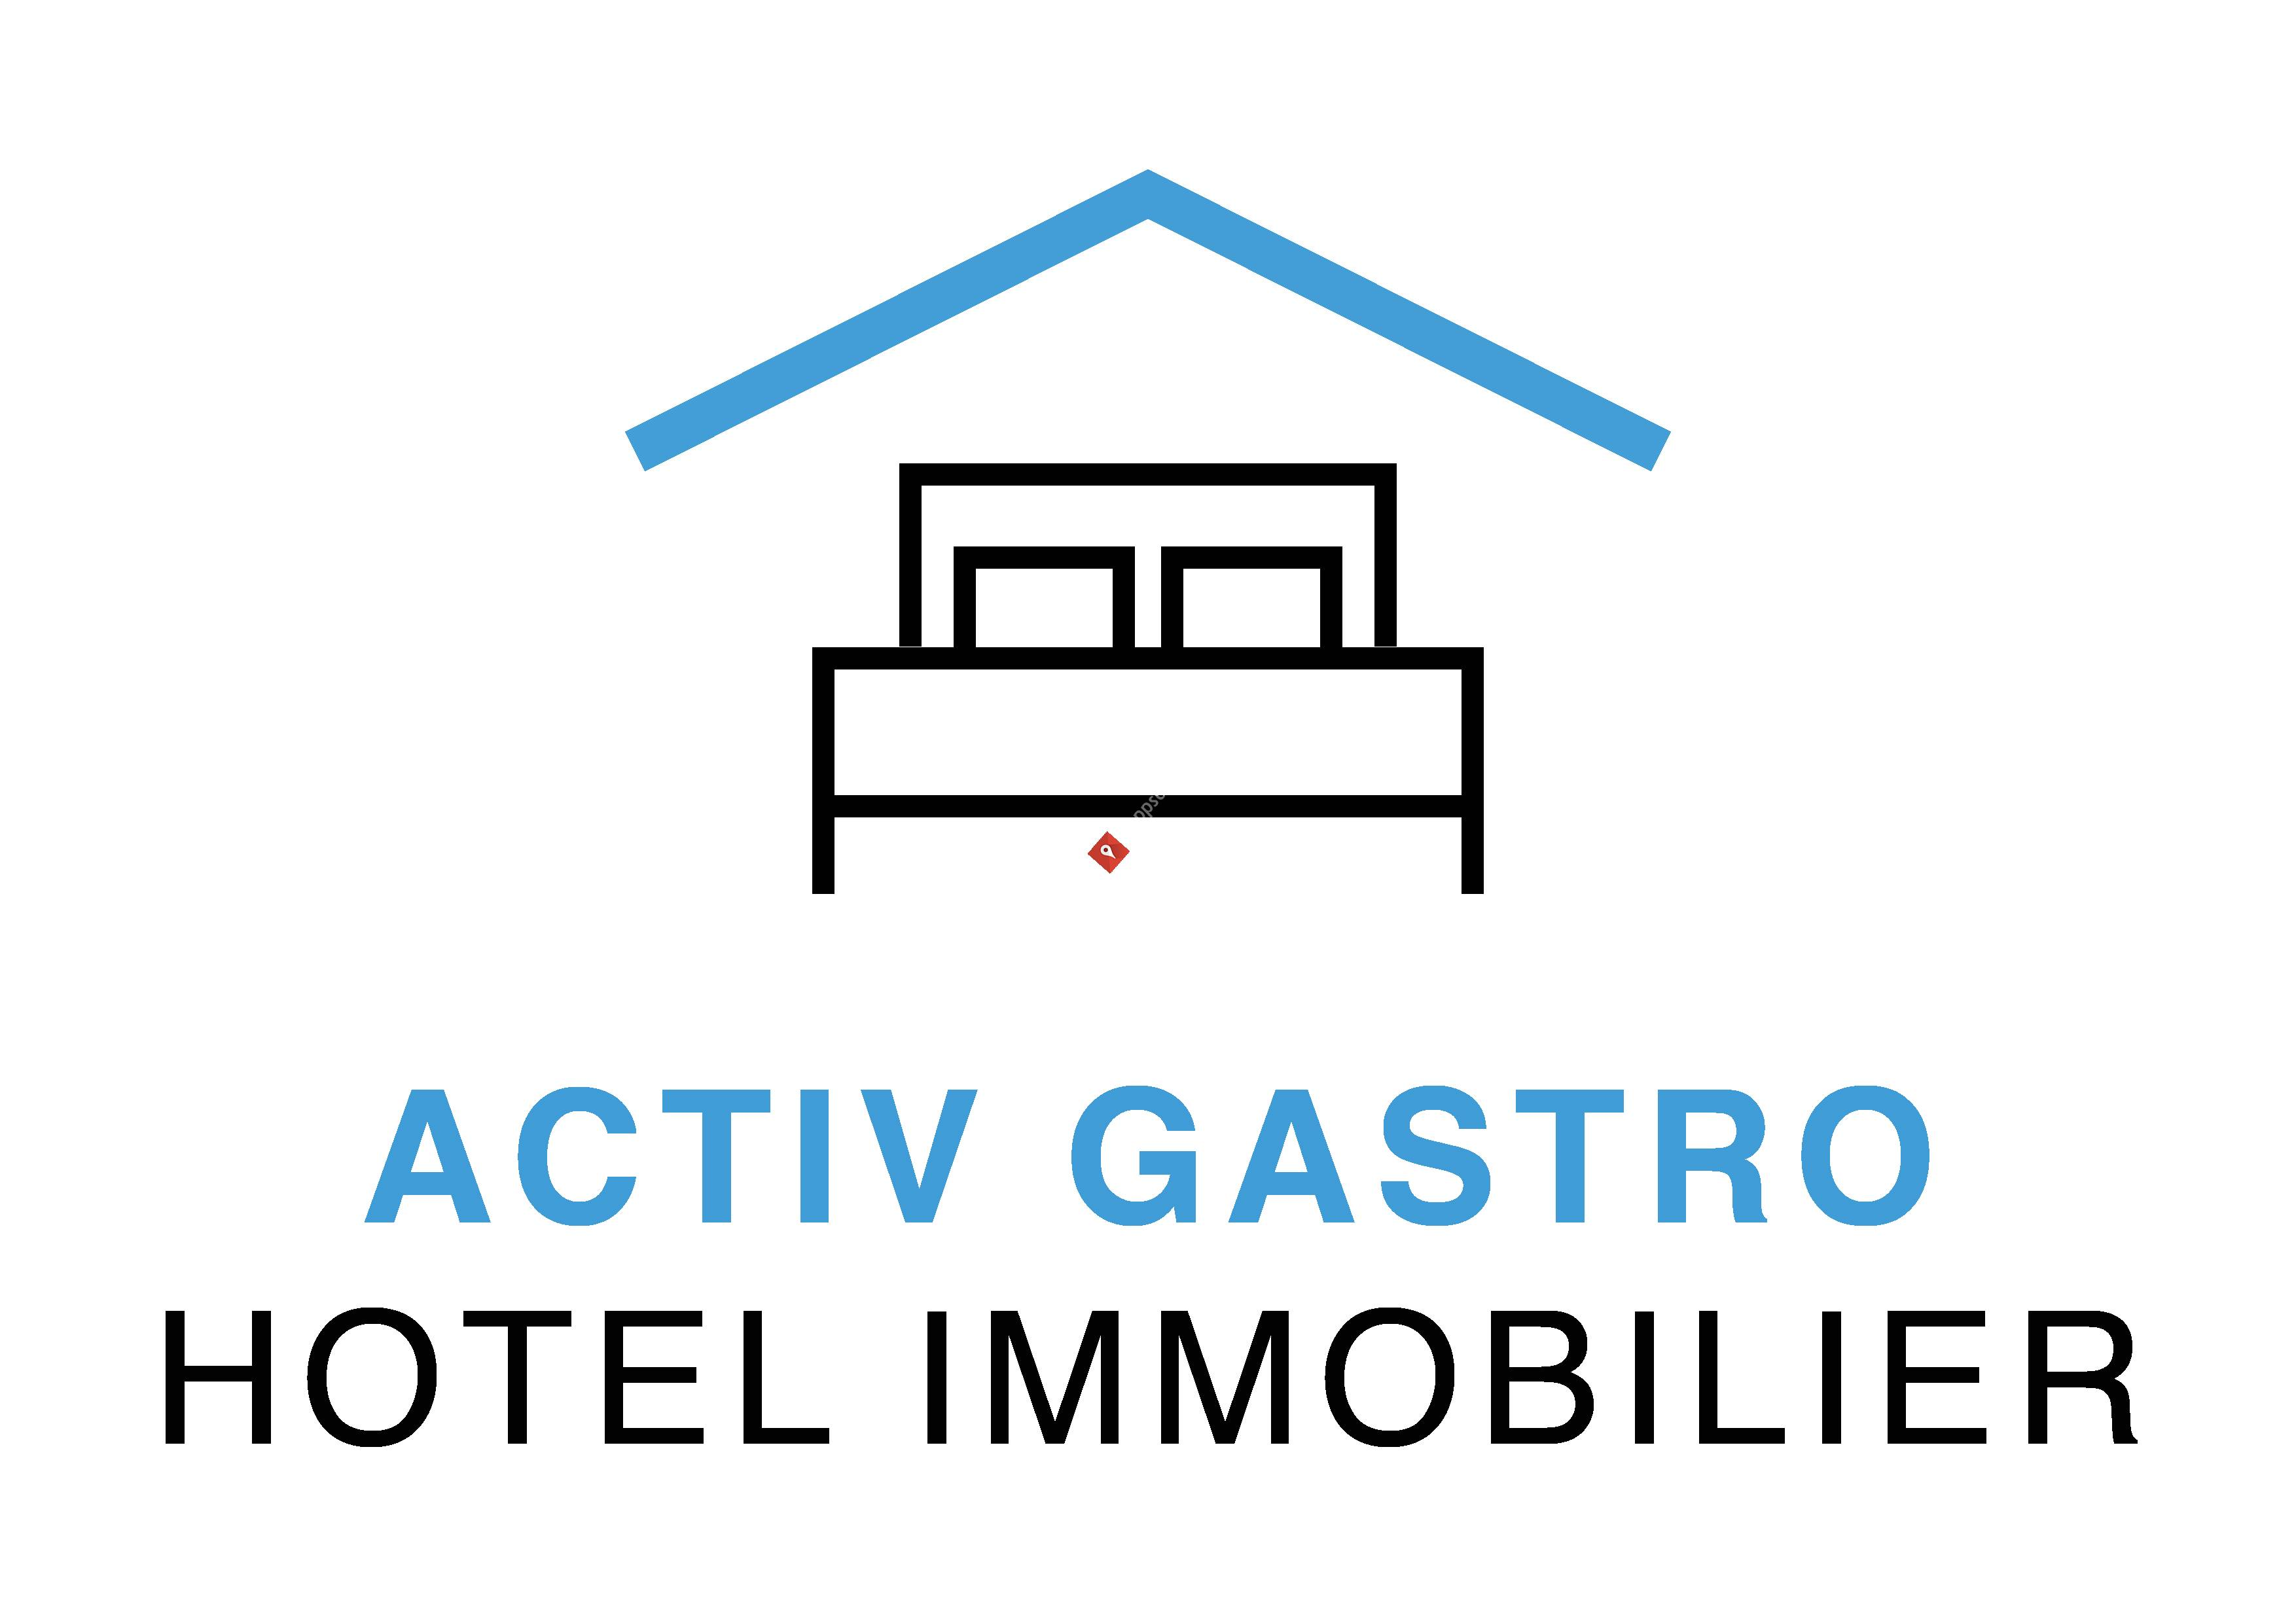 Activ Gastro HOTEL Immobilier